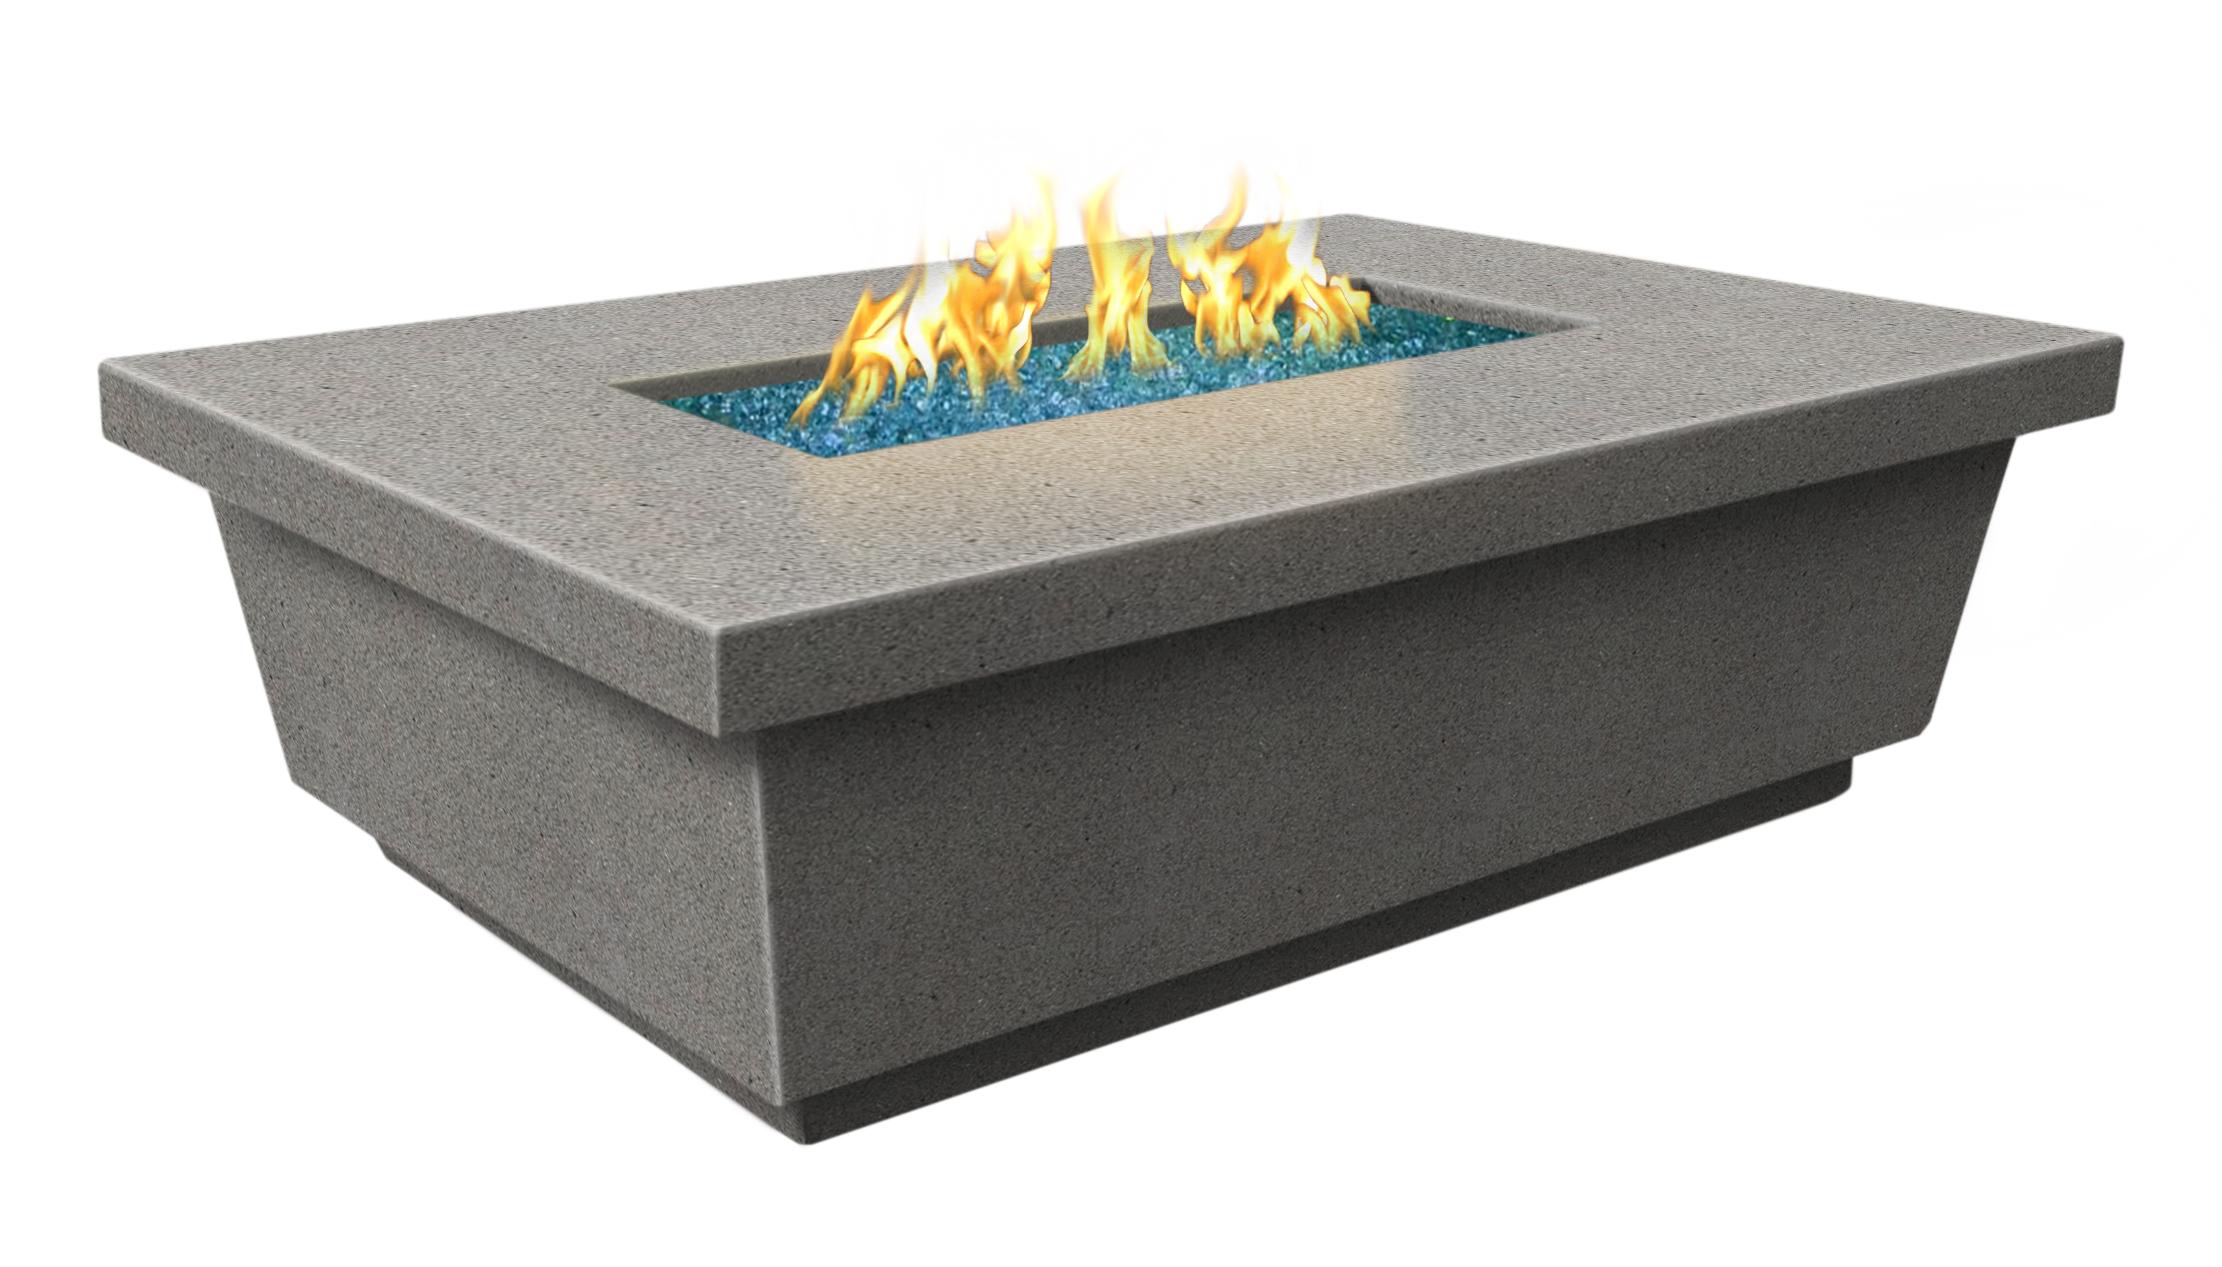 Visit us at: http://burbankfireplace.com/44/1109/product.html